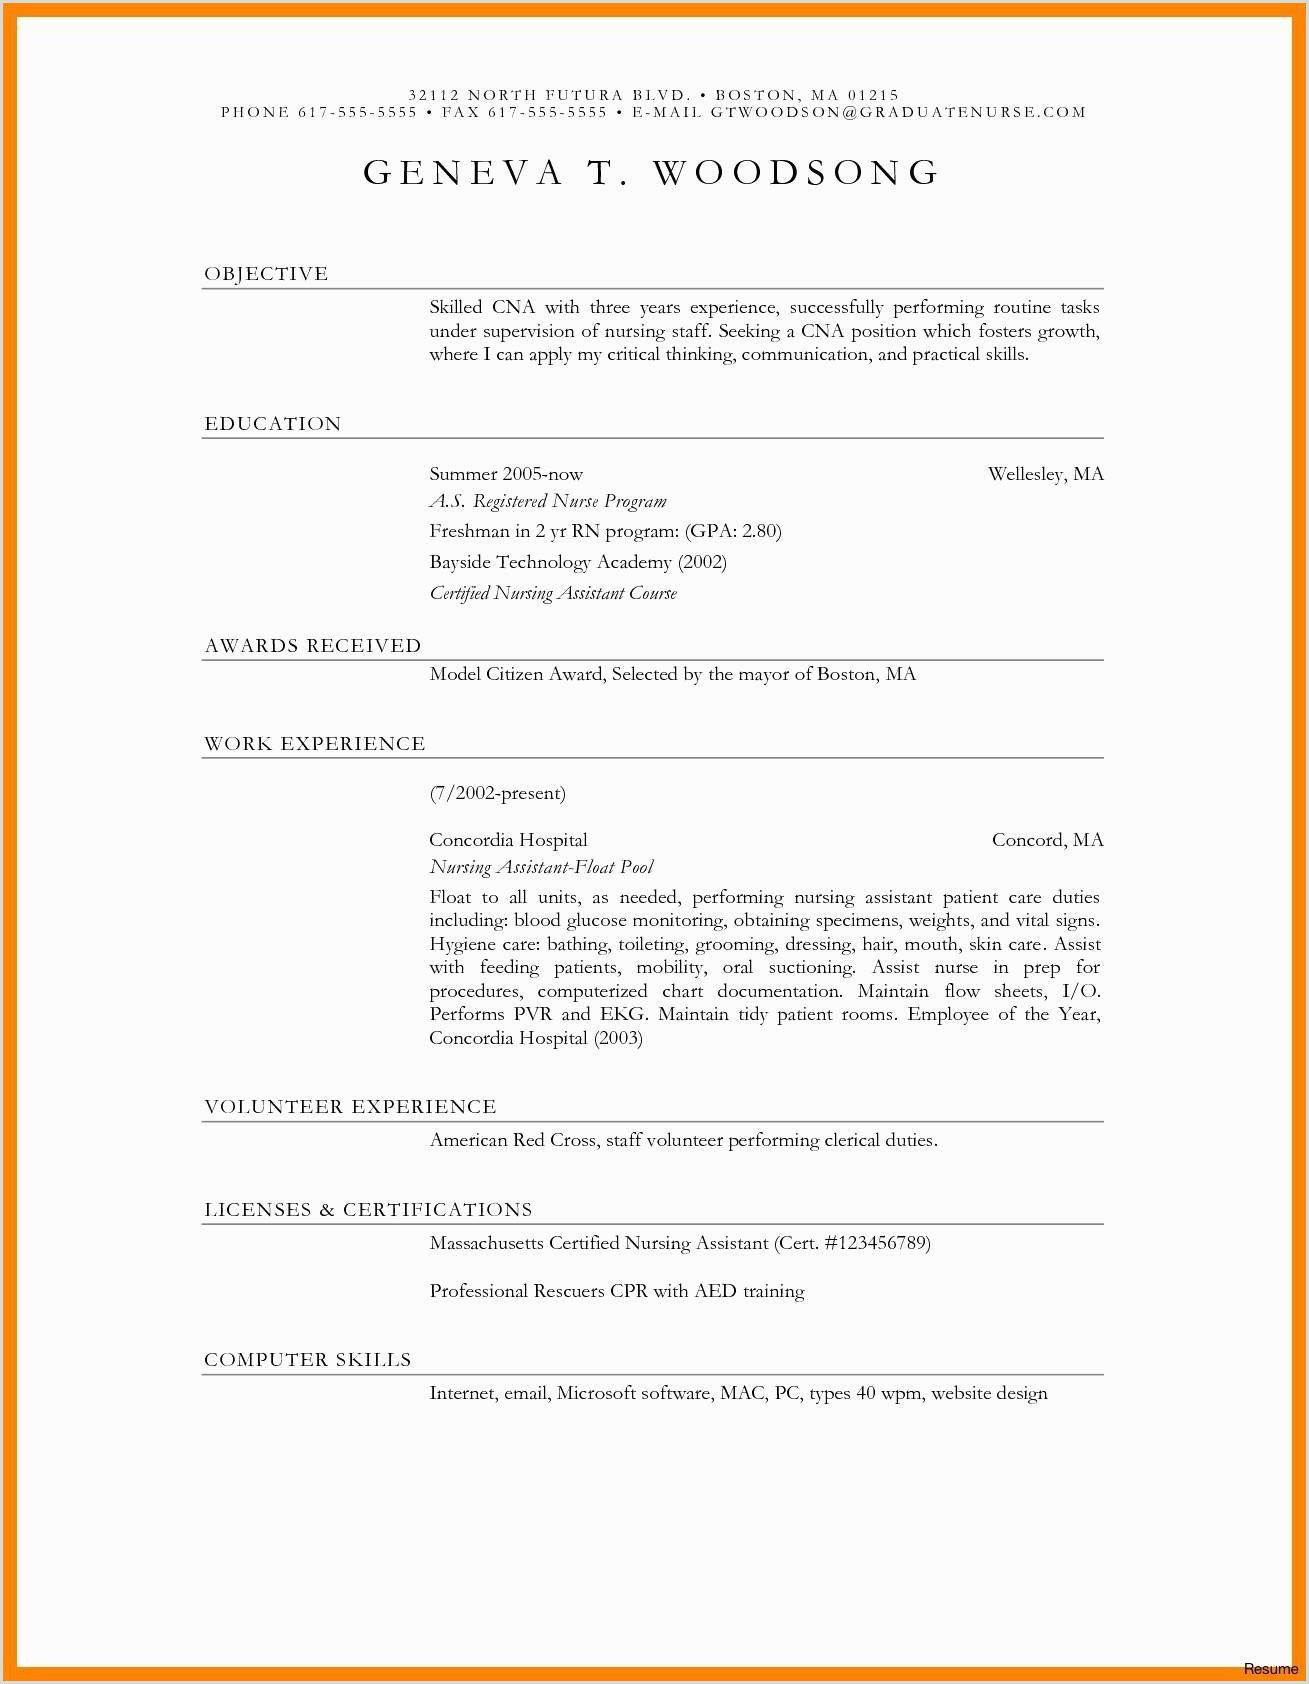 Standard Cv format Singapore Cv Modele original Simple Cv format Simple Word Xenakisworld